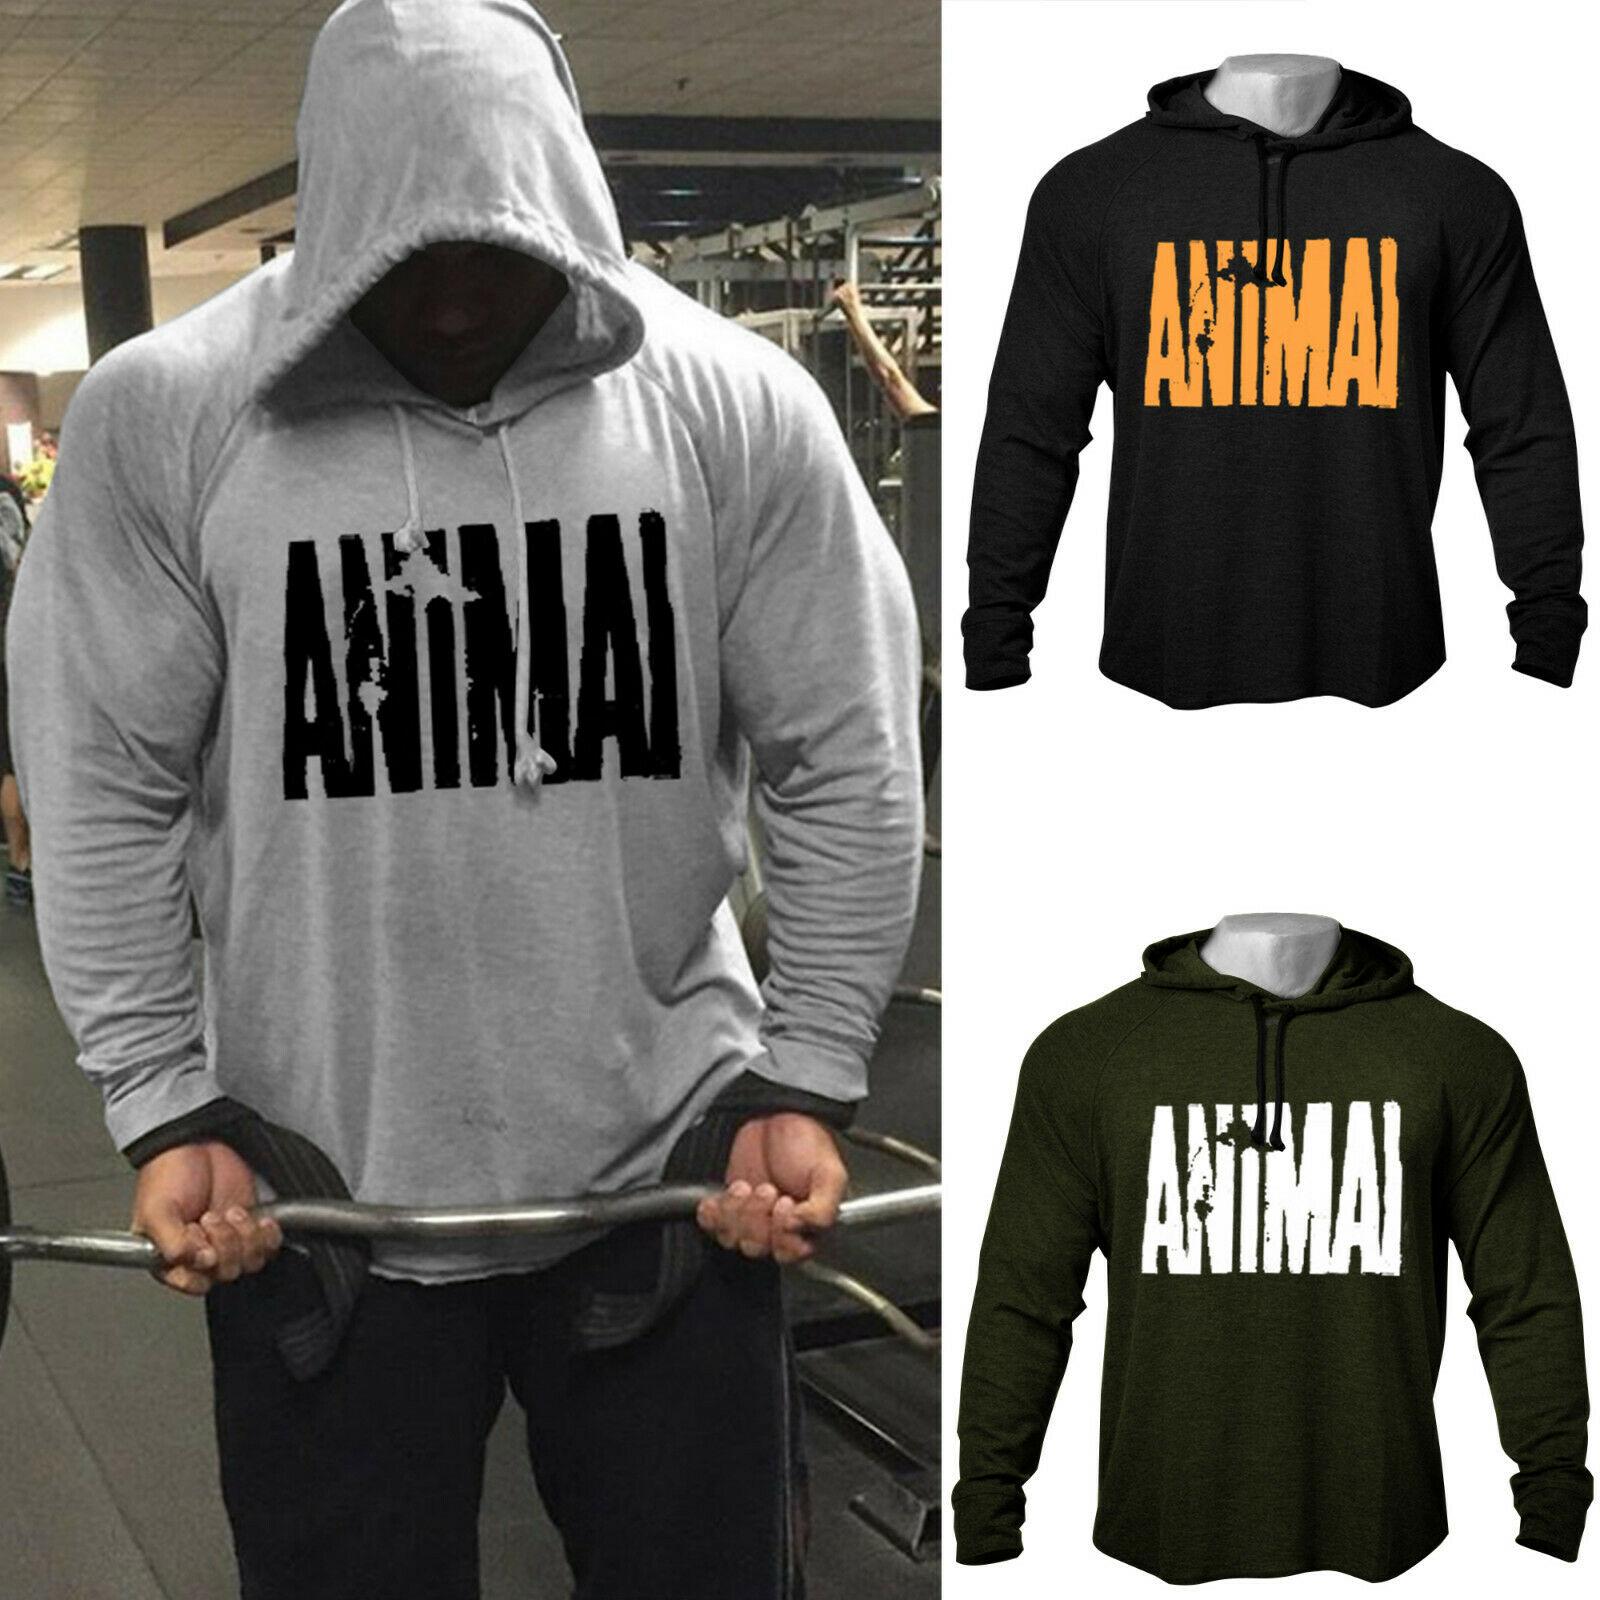 "Men's GYM Workout Print ""ANIMAL"" Bodybuilding Cotton Raglan Hoodies Sweatshirts Raw-Cut&Hem-Cut Hoodies Tracksuit Top"